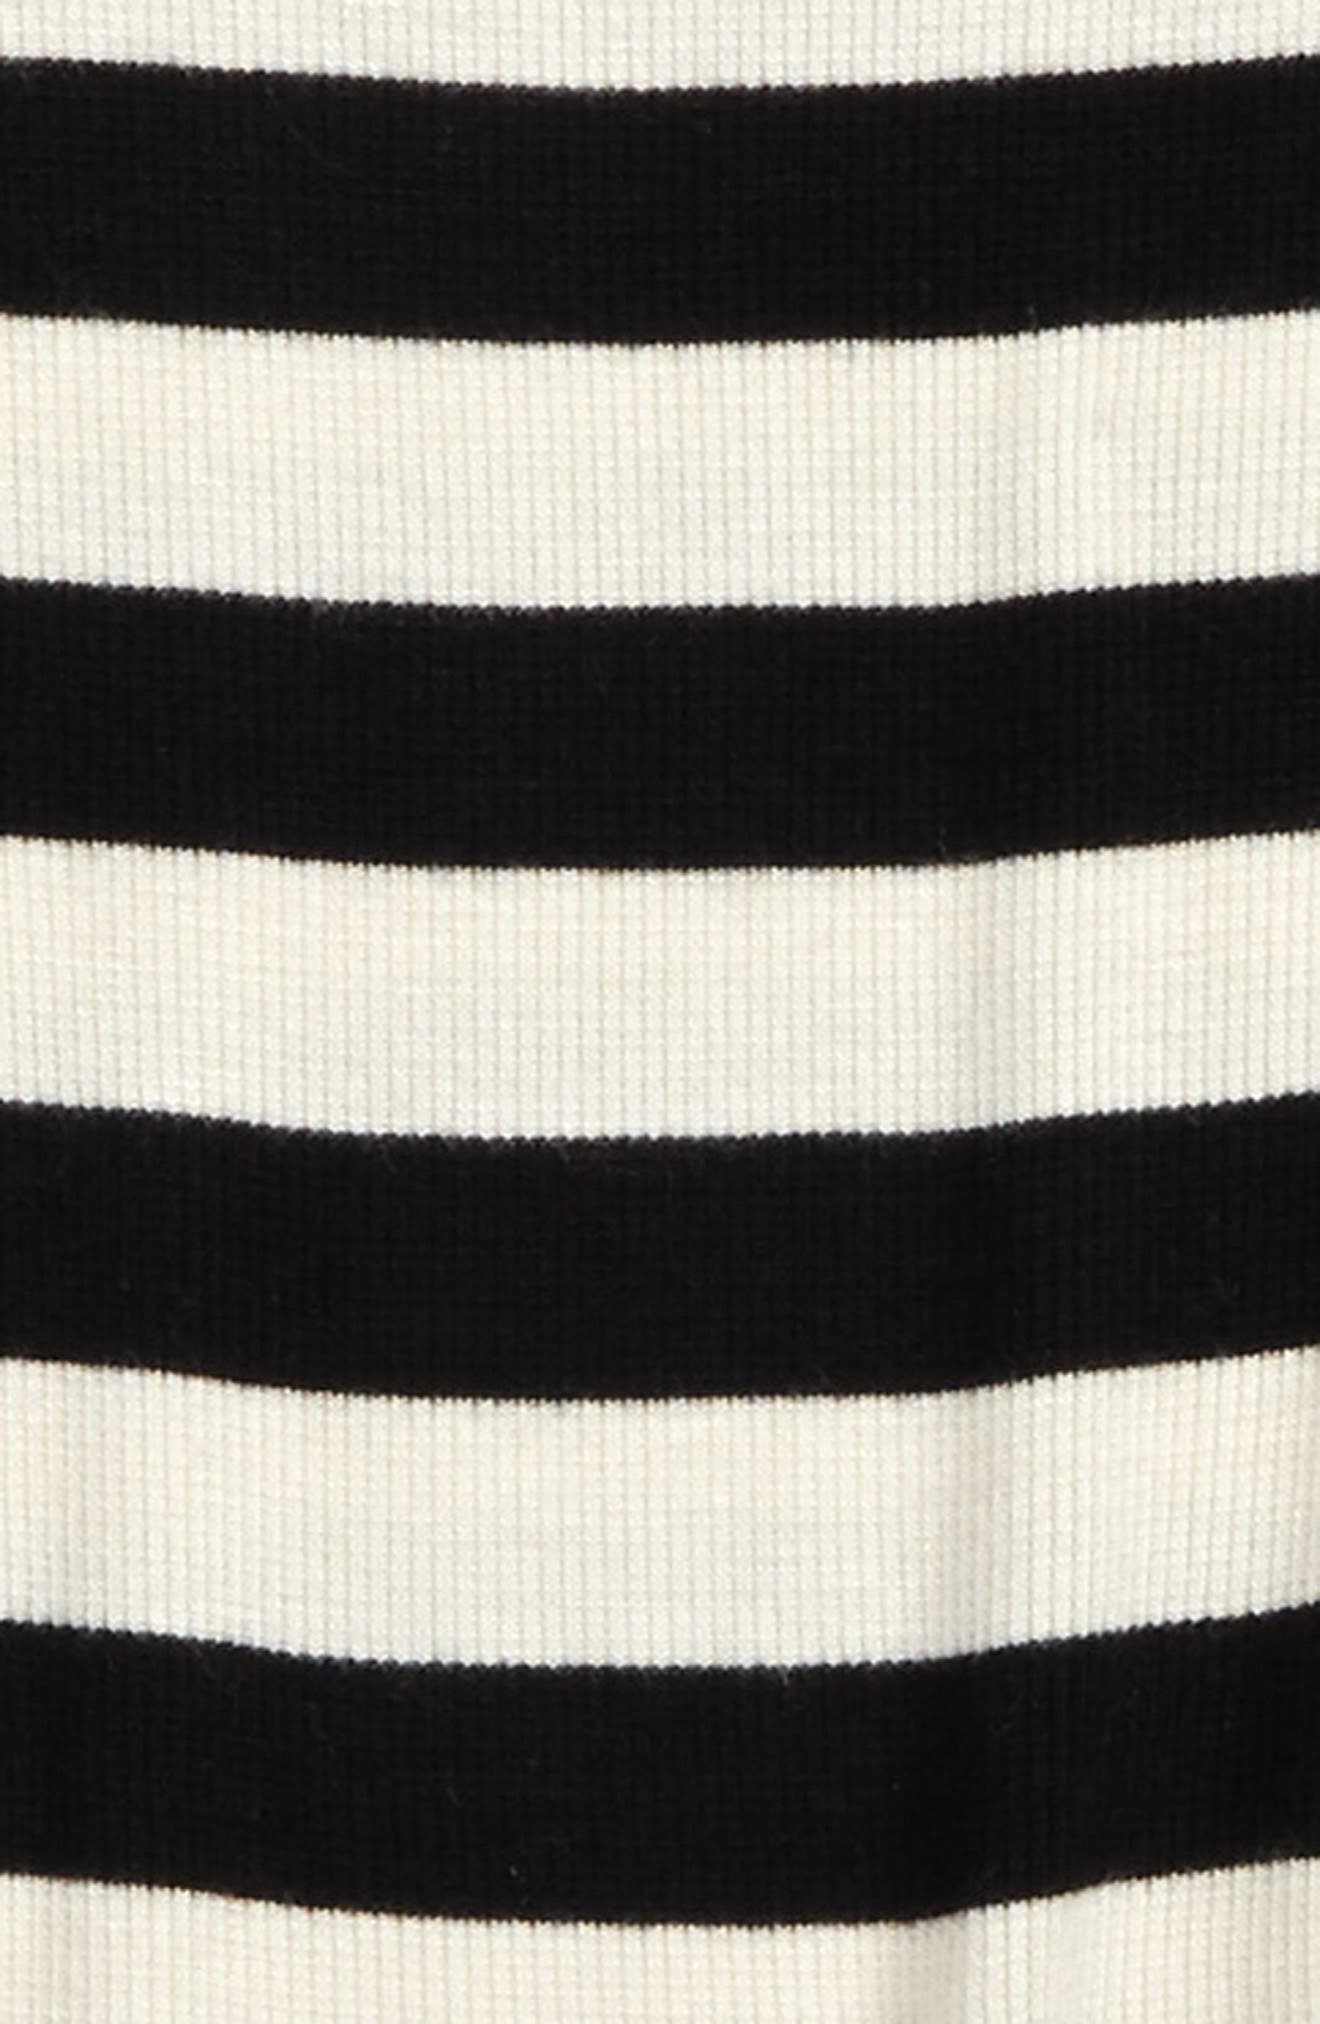 Merrow Edge Stripe Tee,                             Alternate thumbnail 2, color,                             002